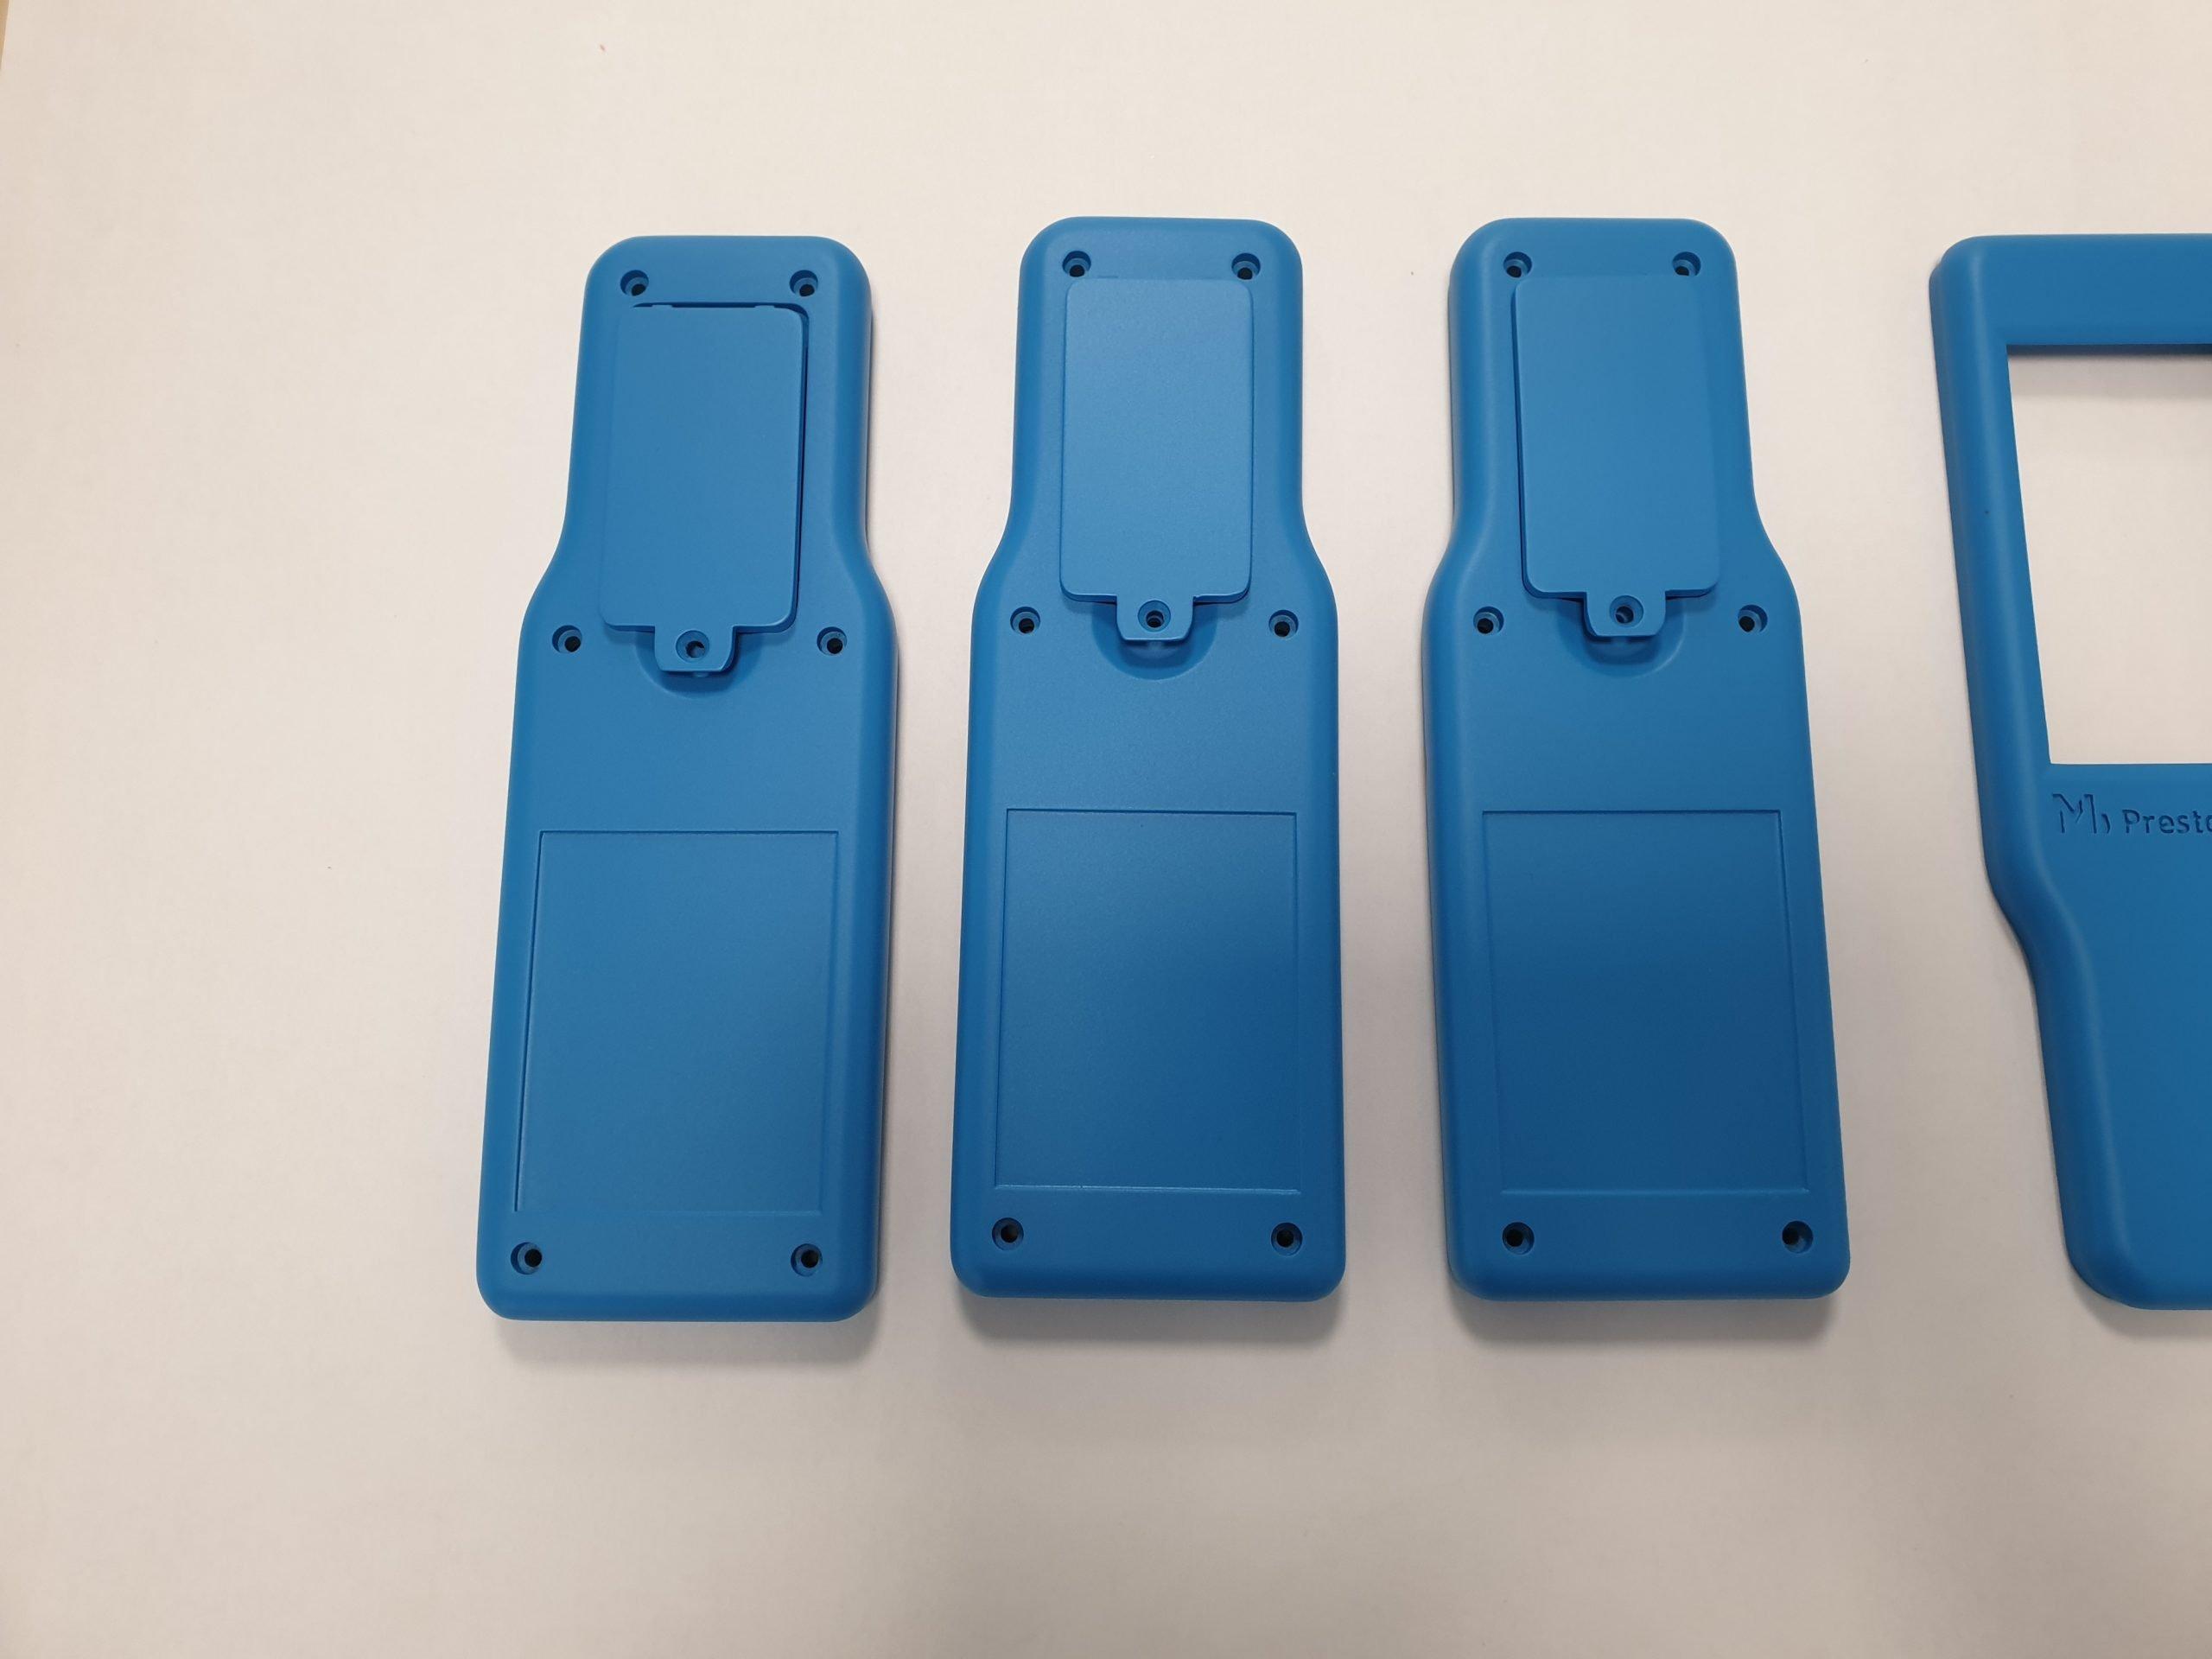 3d프린터 SLA 시제품 제작